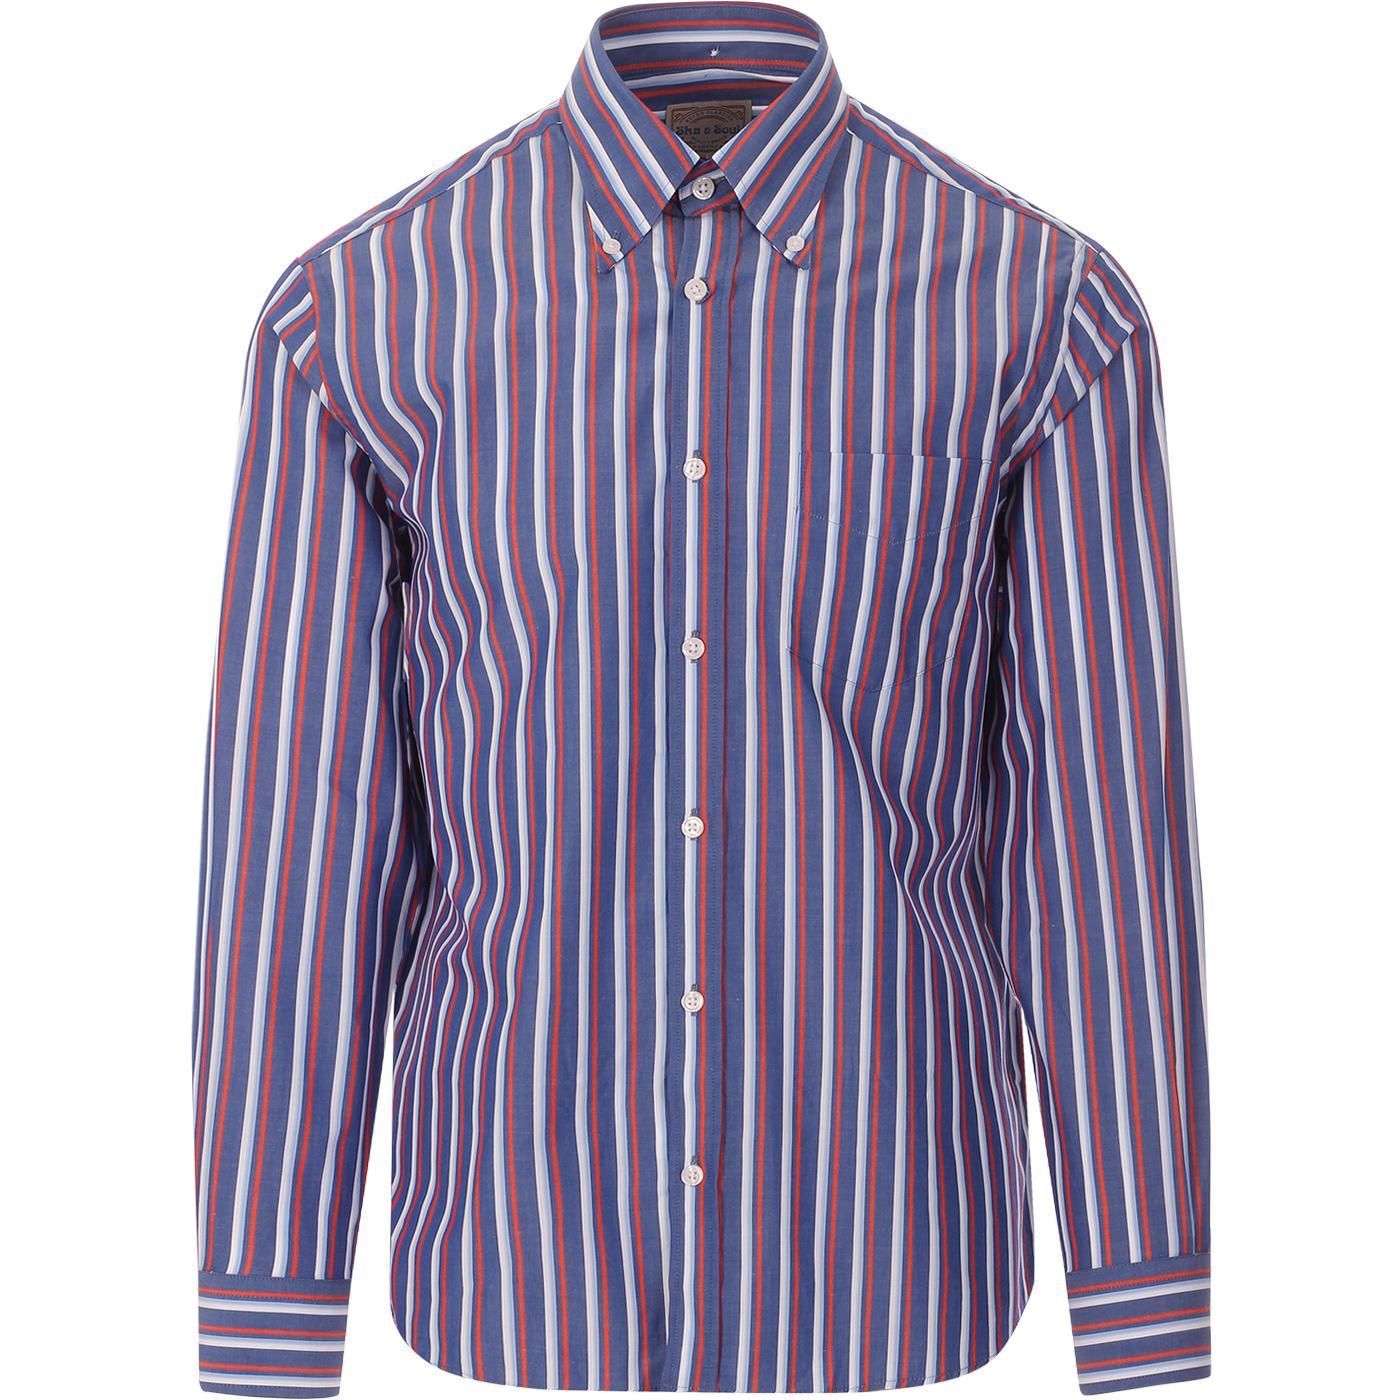 SKA & SOUL Mod Spearpoint Stripe Button Down Shirt